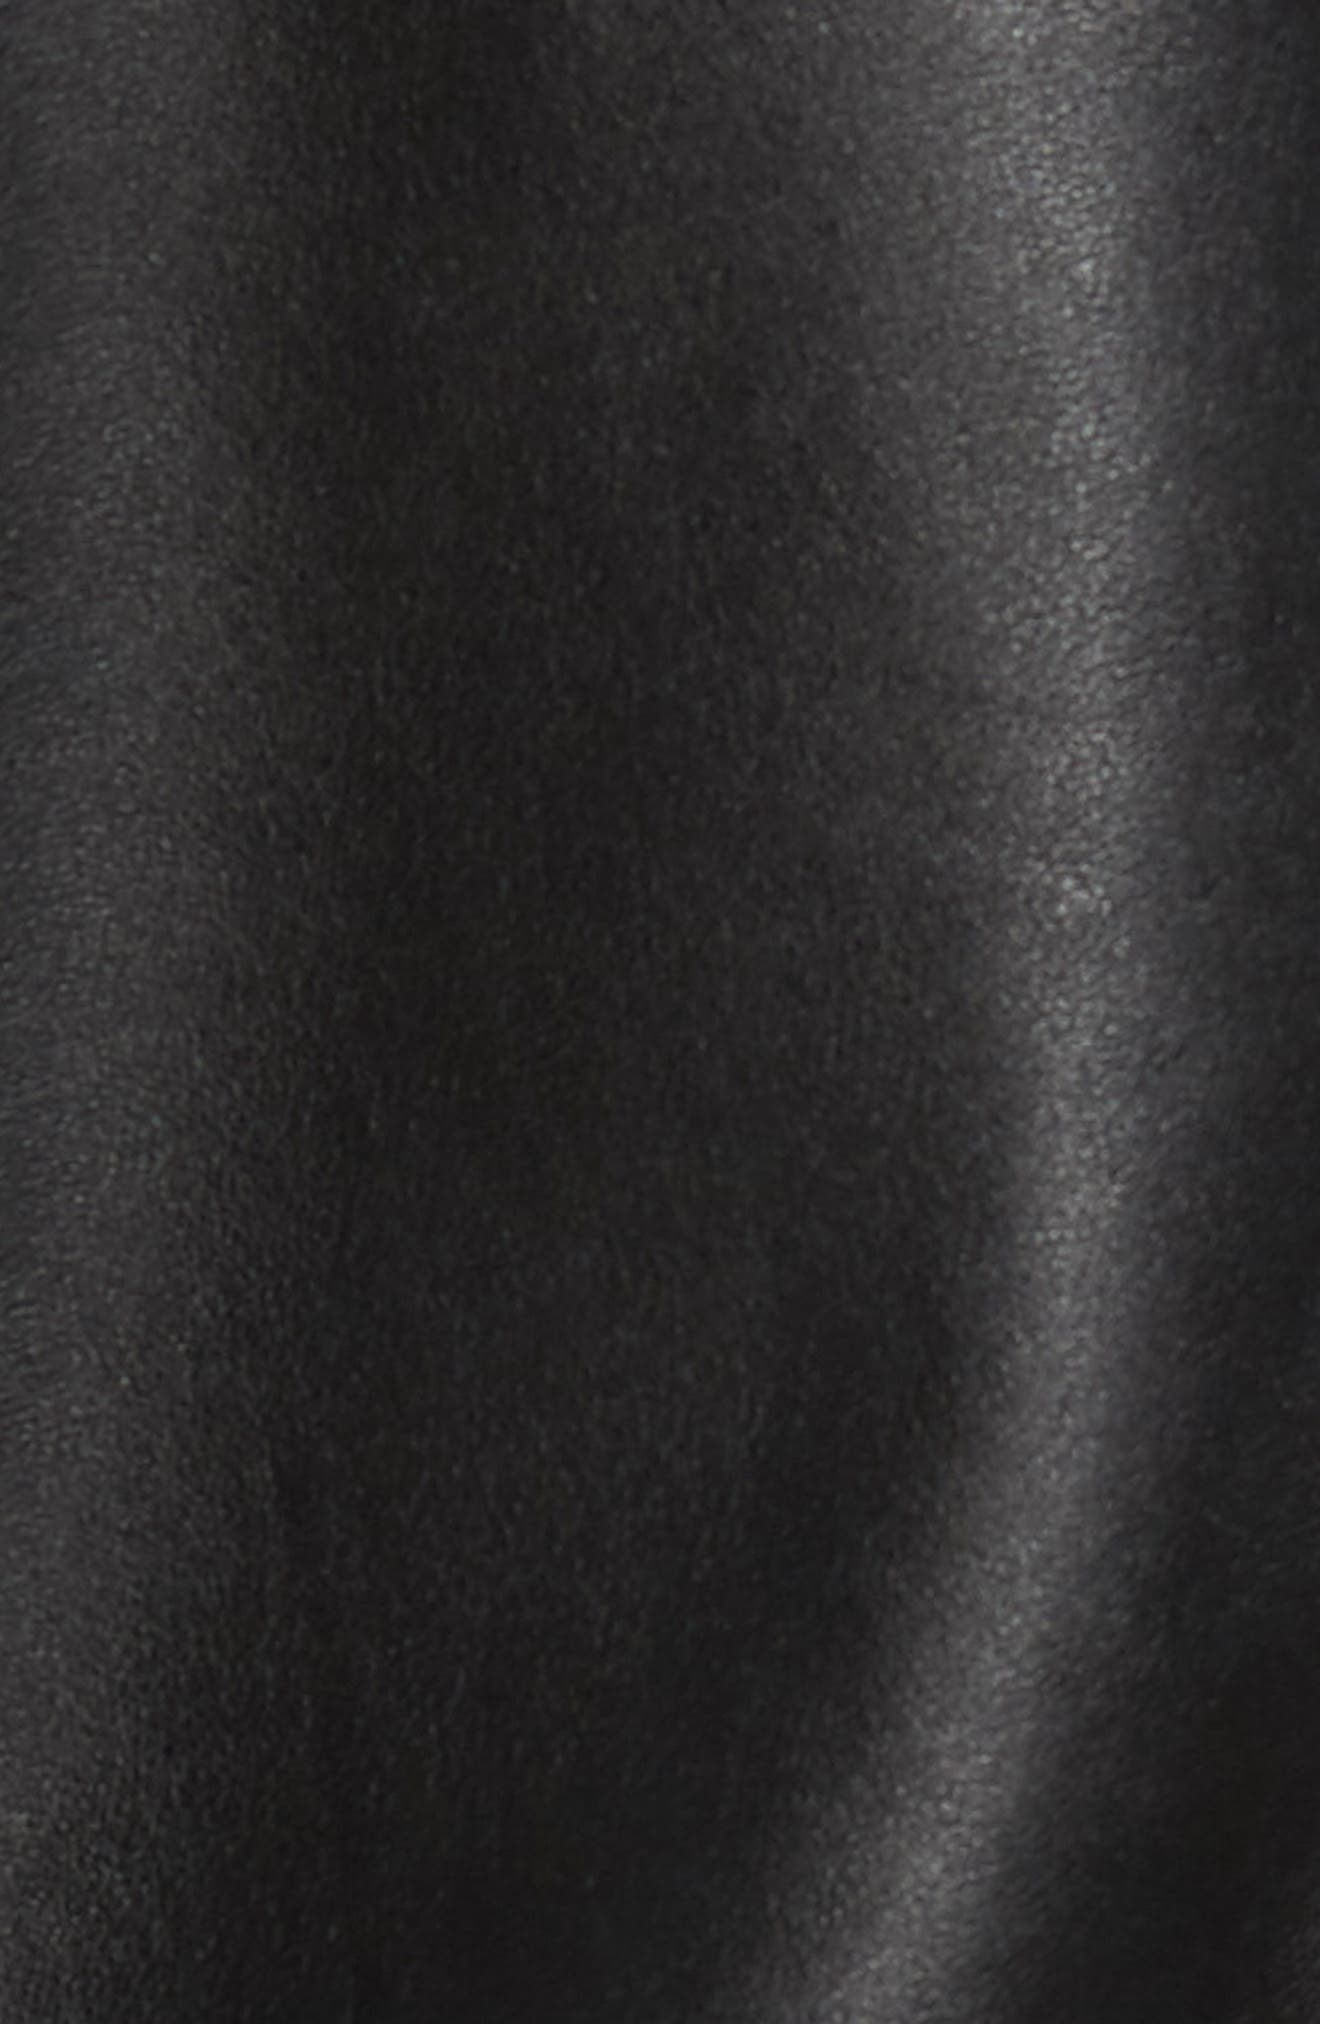 Reversible Leather Jacket,                             Alternate thumbnail 6, color,                             Black/ Navy